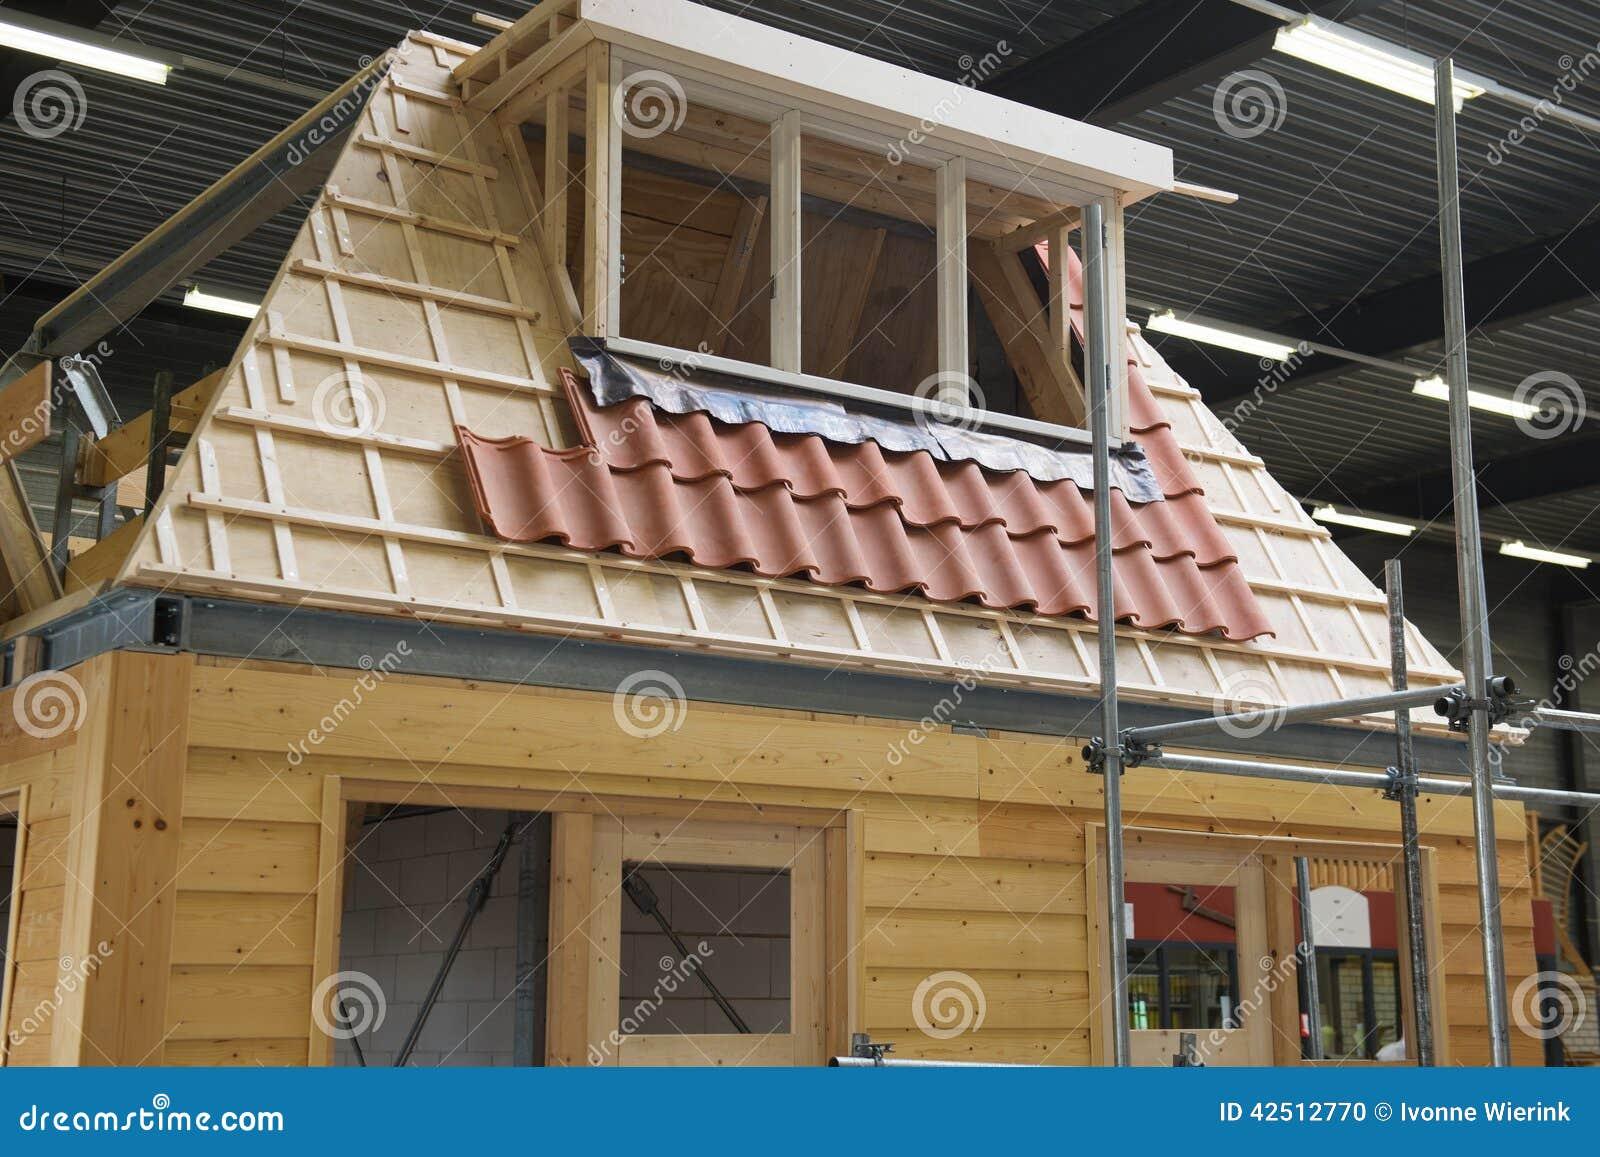 C mo construir una casa de madera foto de archivo imagen - Construir una casa de madera ...